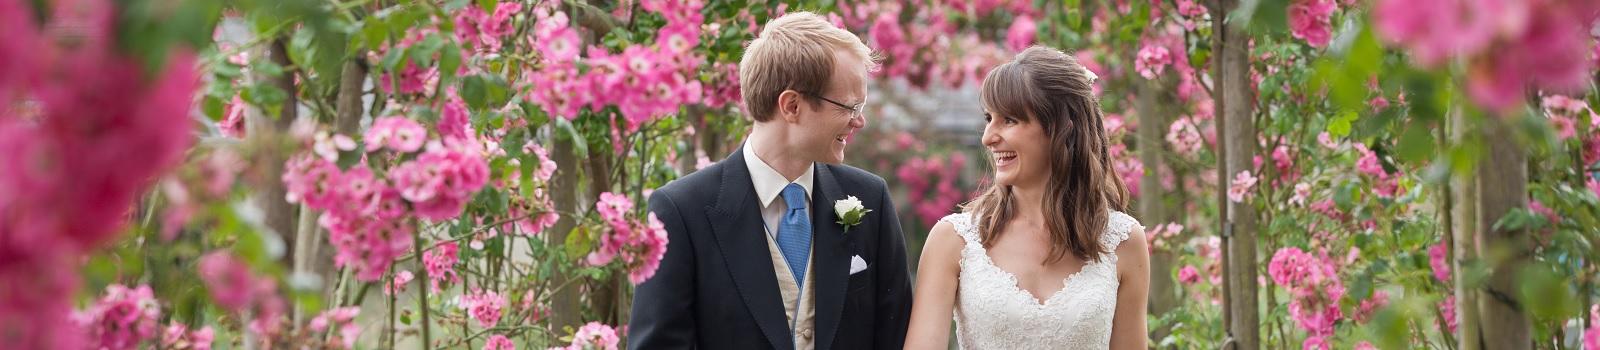 Houghton-Lodge-Wedding-Ceremonies